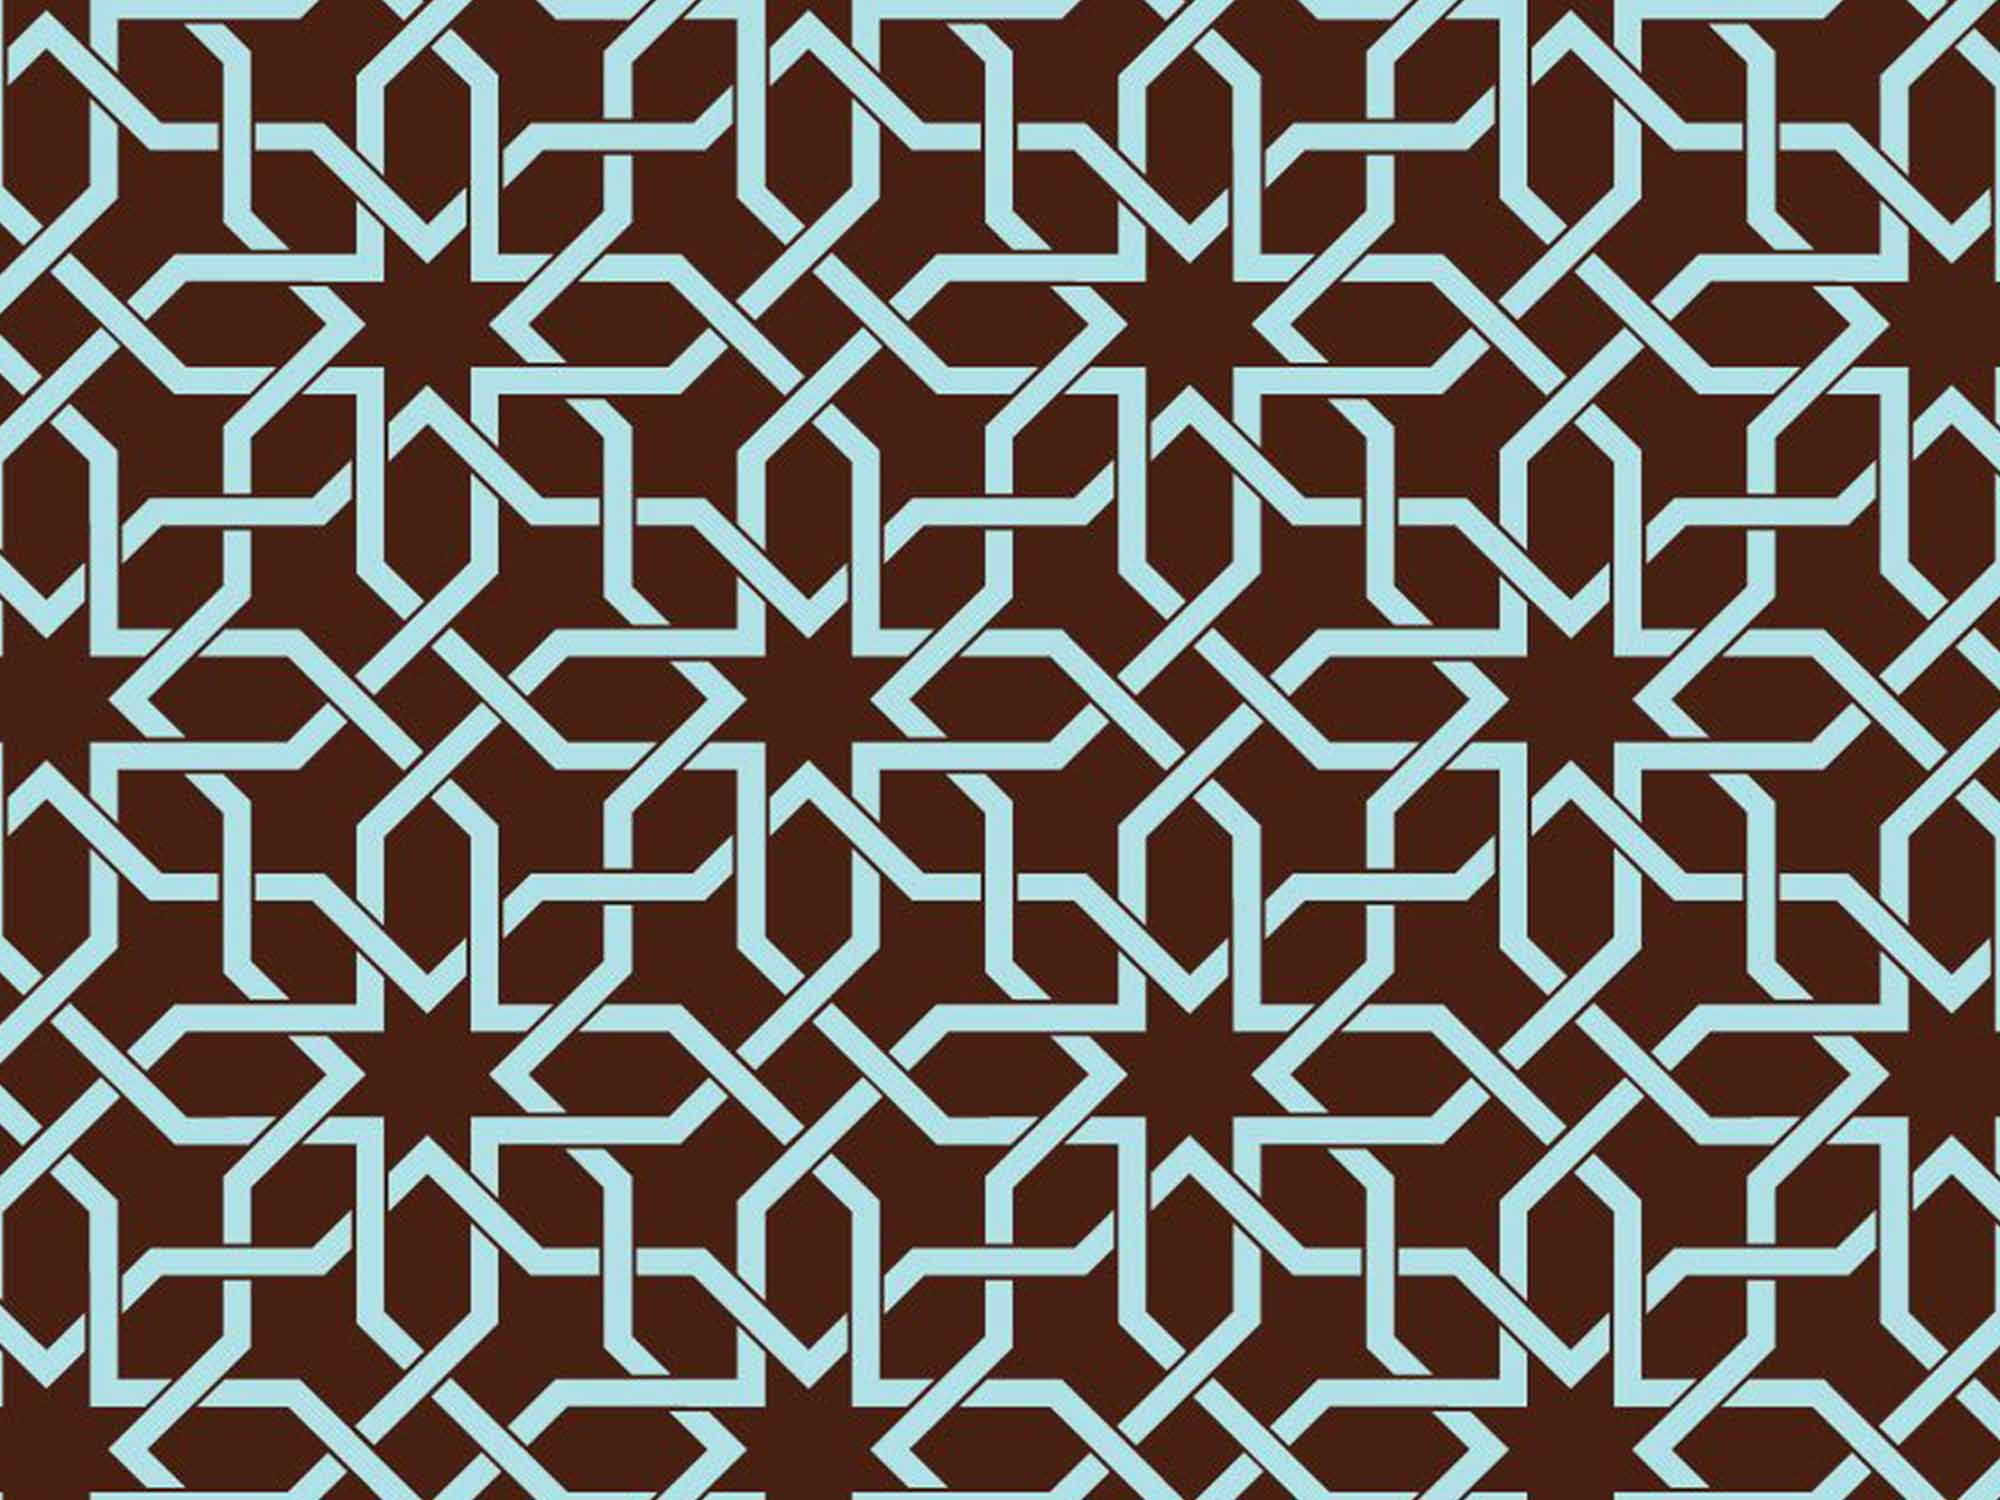 Papel de Parede para Sala Geométrico 0029 - Adesivos de Parede  - Paredes Decoradas